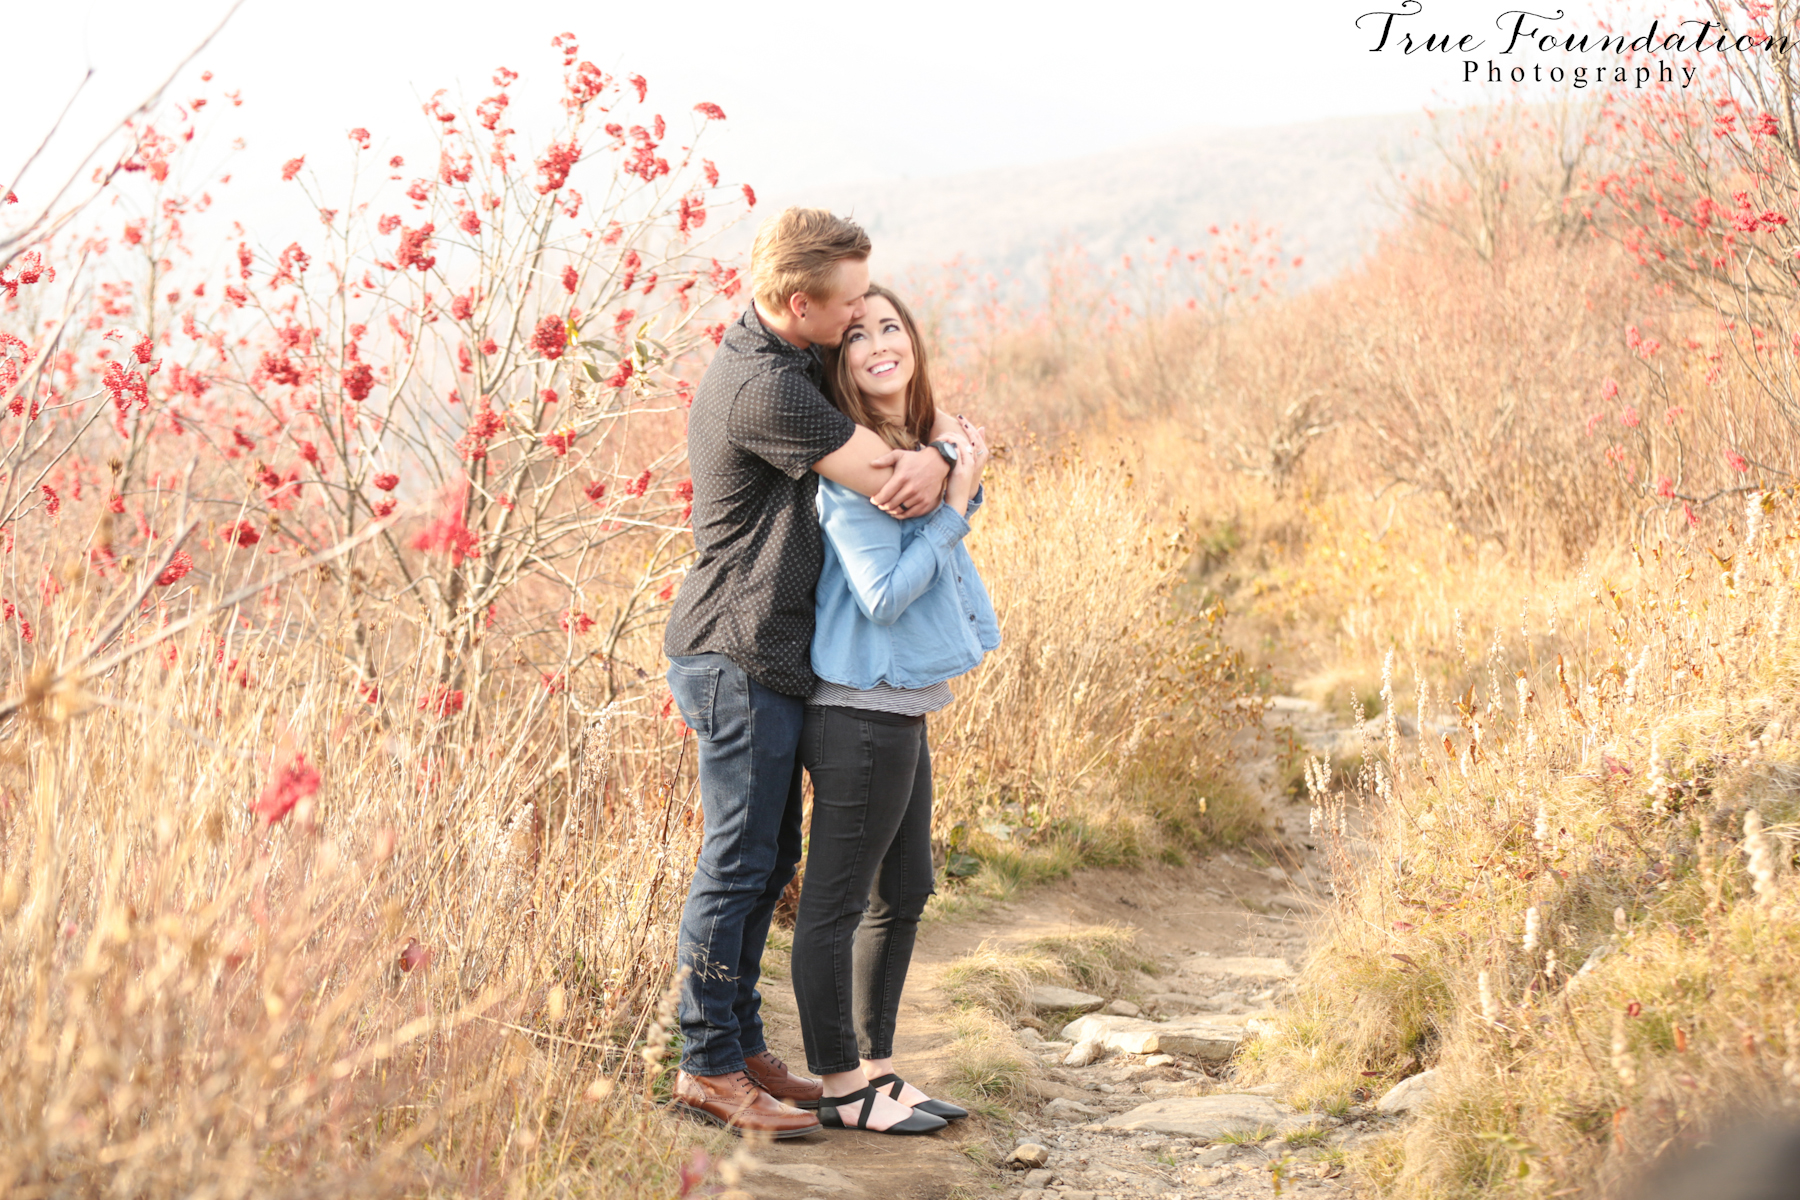 Black Balsam Knob Nc Photographer Wedding Engagement Photography Photos Asheville Hendersonville Mountain Anniversary Couple Hiking 35